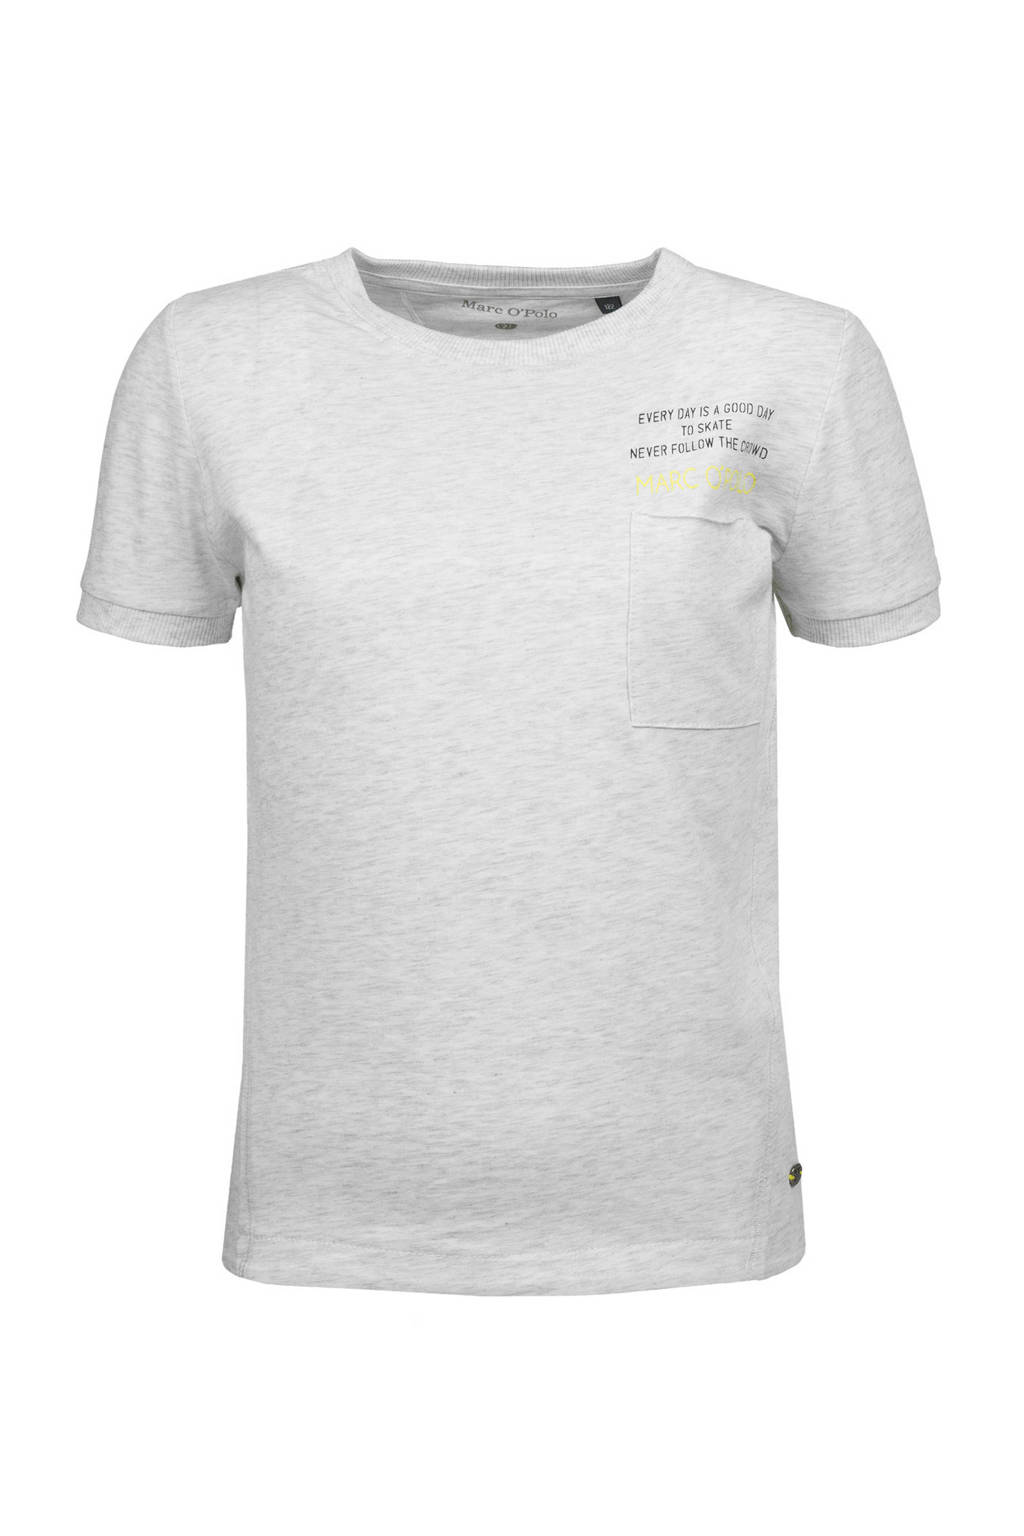 Marc O'Polo T-shirt met tekst lichtgrijs, Lichtgrijs